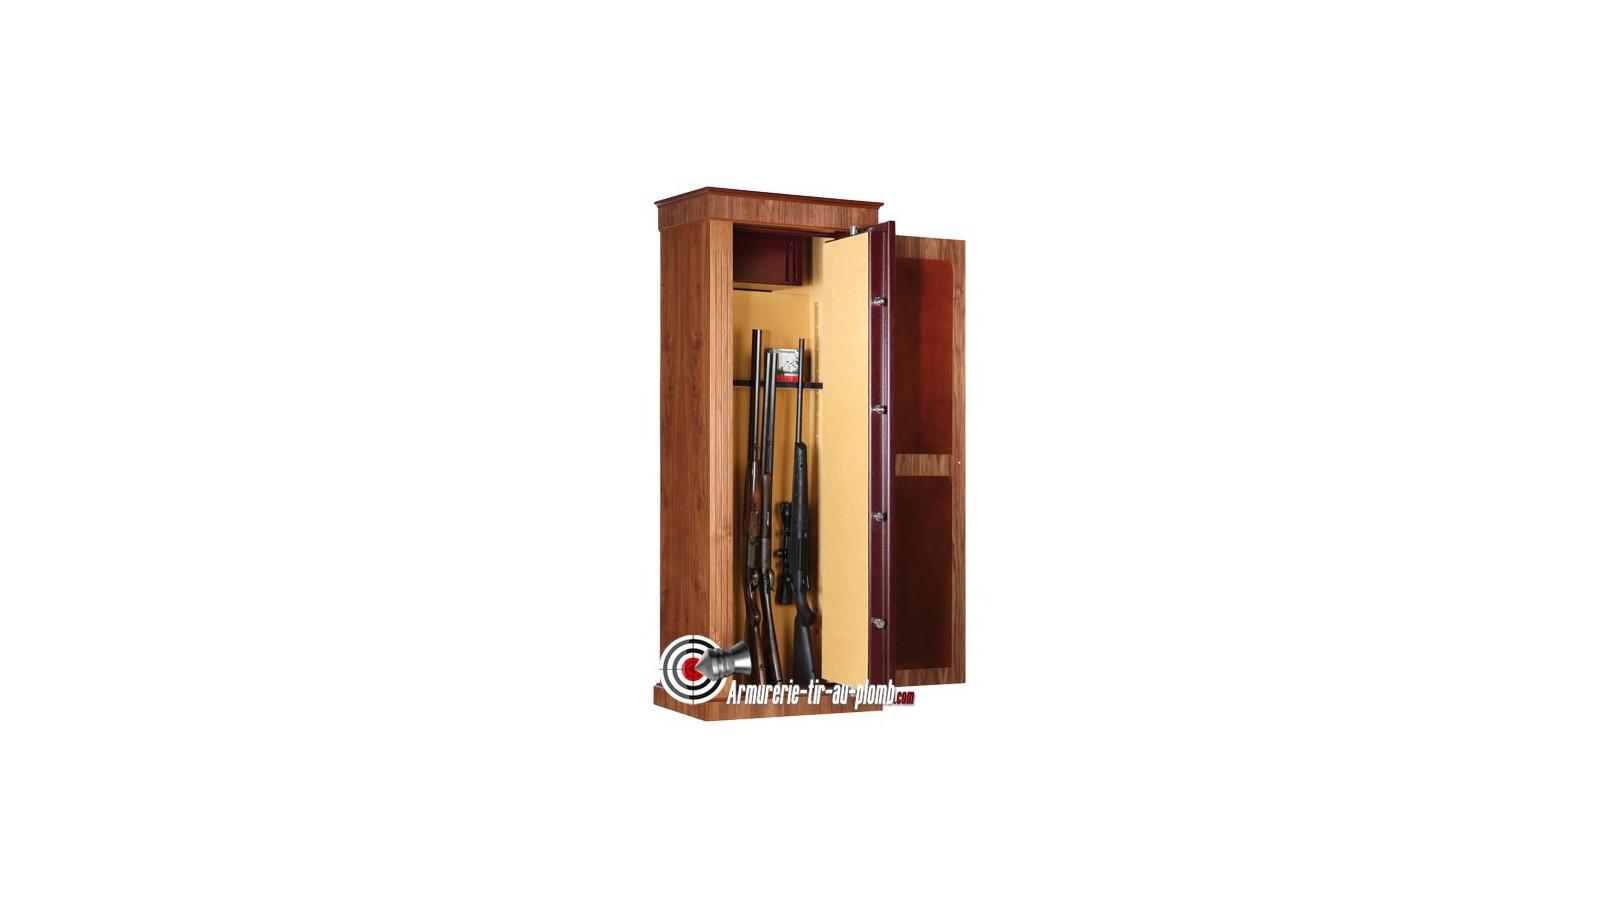 armoire forte infac wood cover safe 8 armes longues. Black Bedroom Furniture Sets. Home Design Ideas